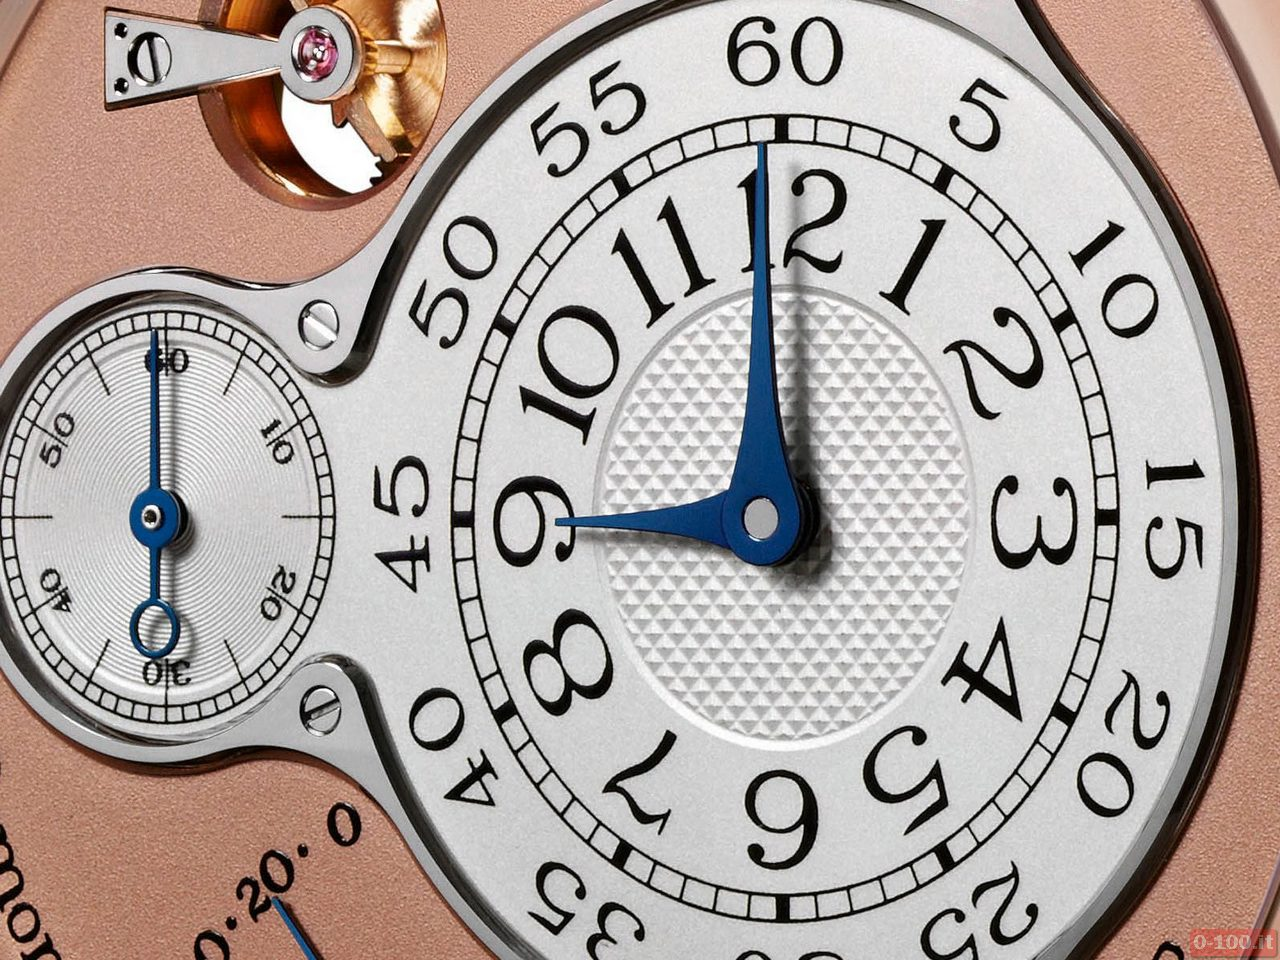 f-p-journe-chronometre-optimum-0-100_10